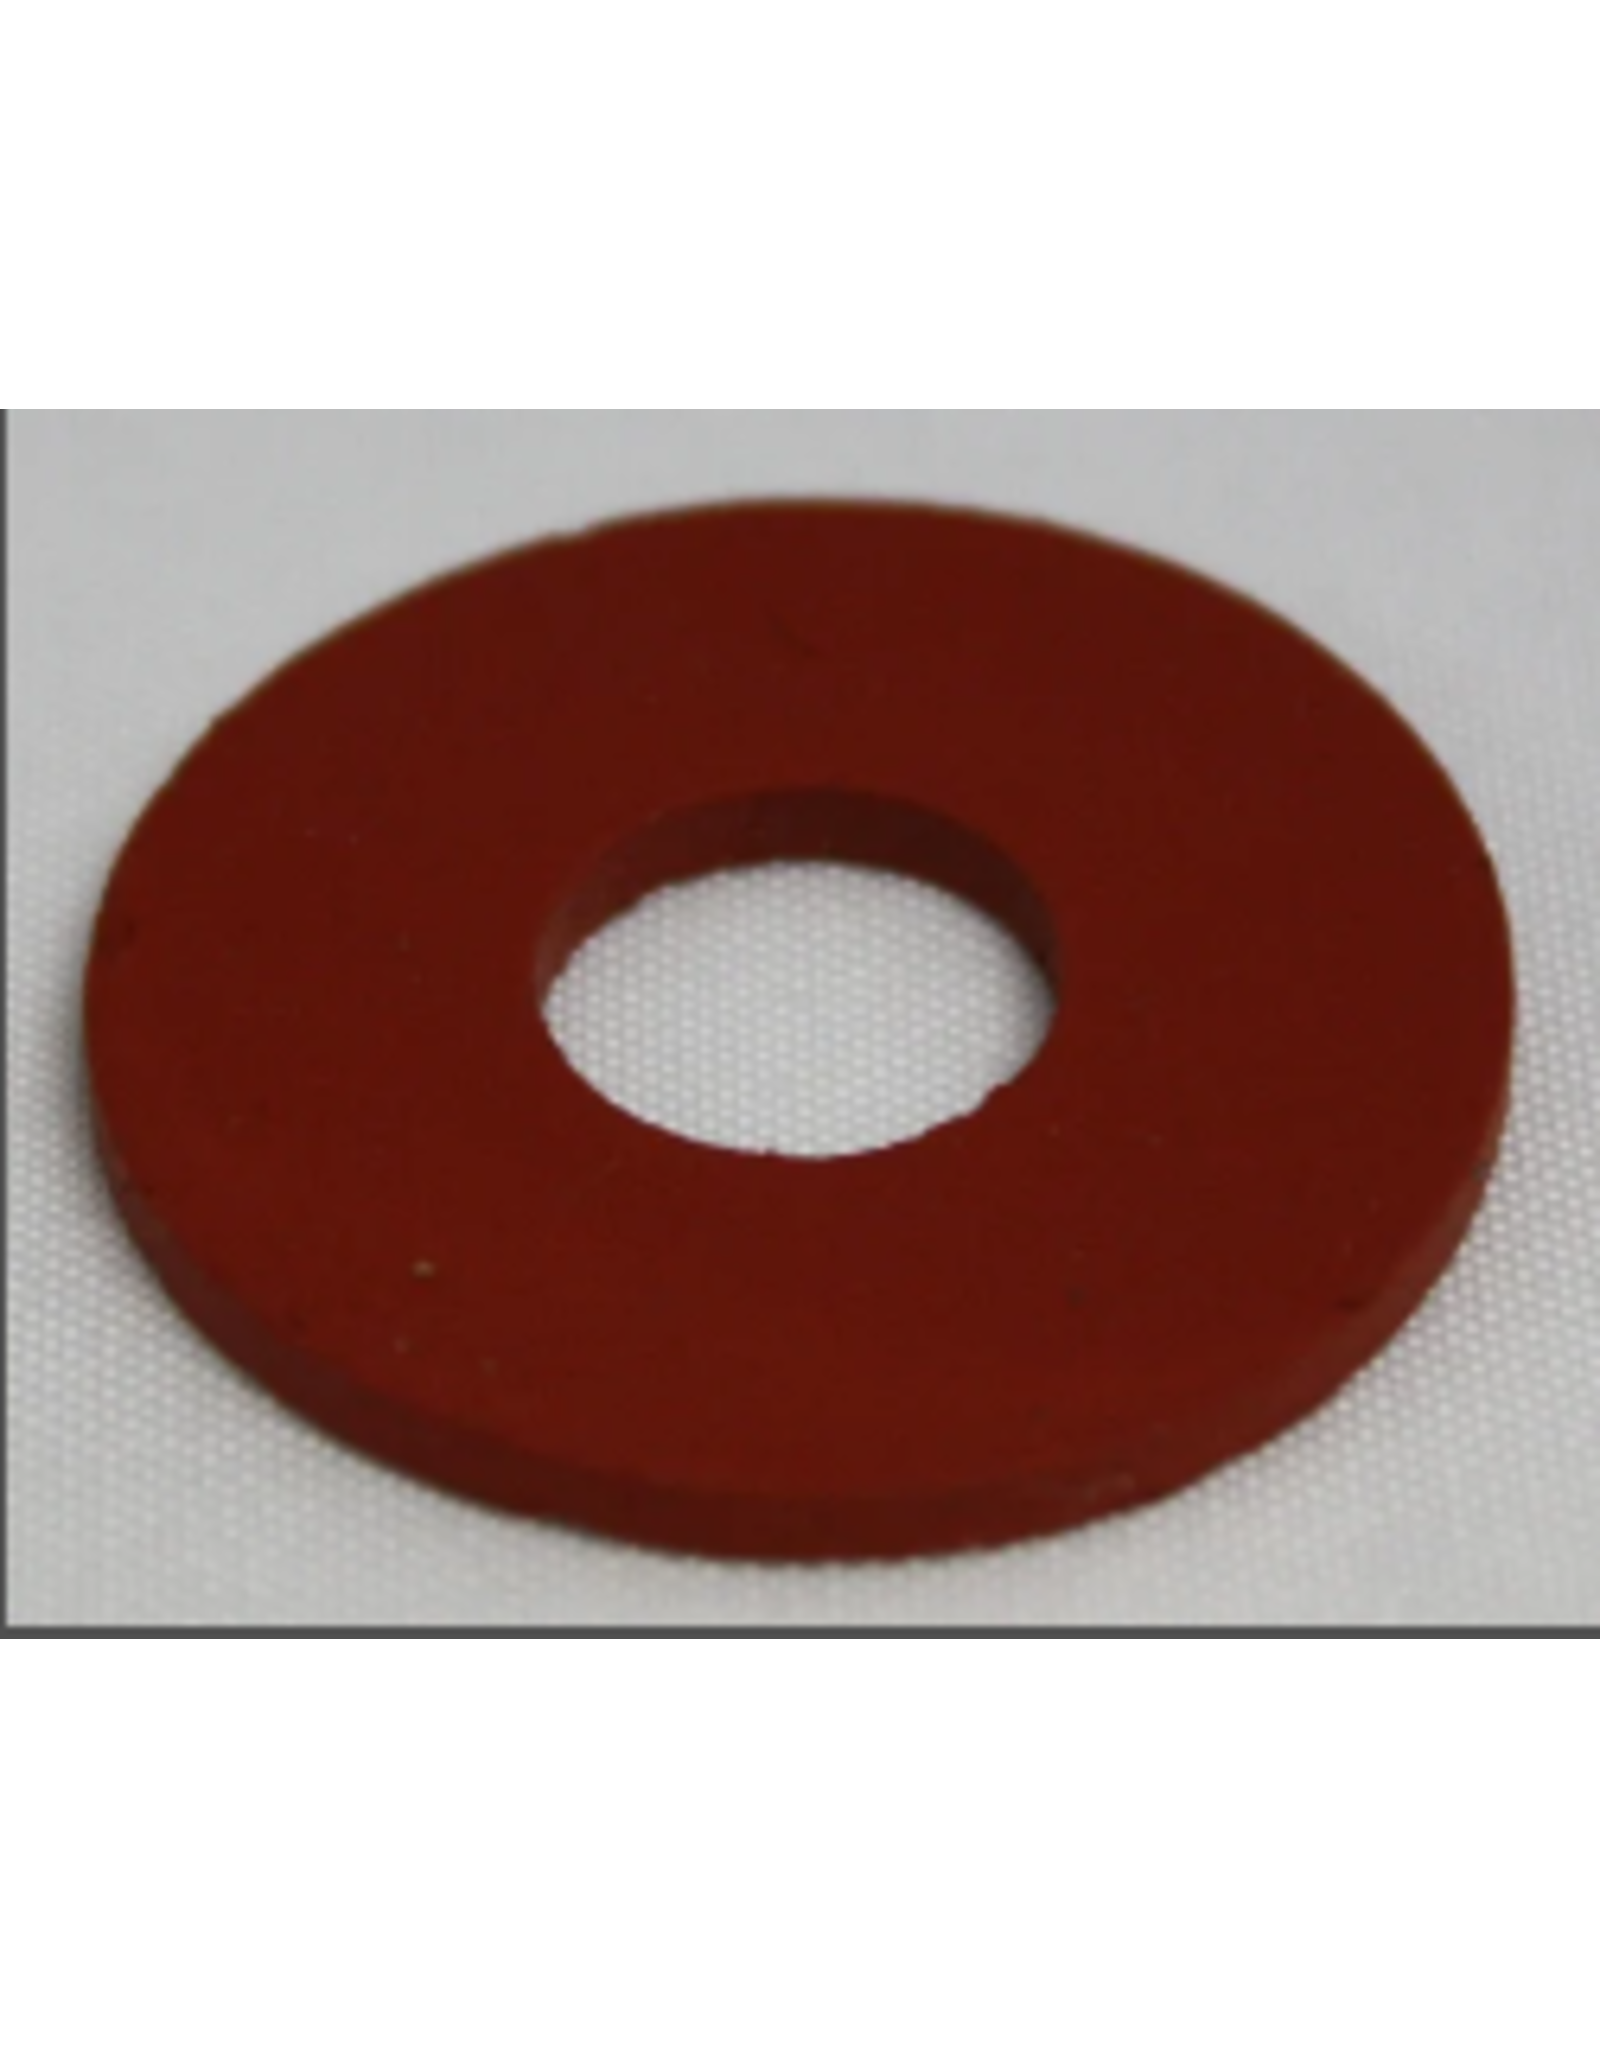 Rubber ring vuldop comel  per 2 st.